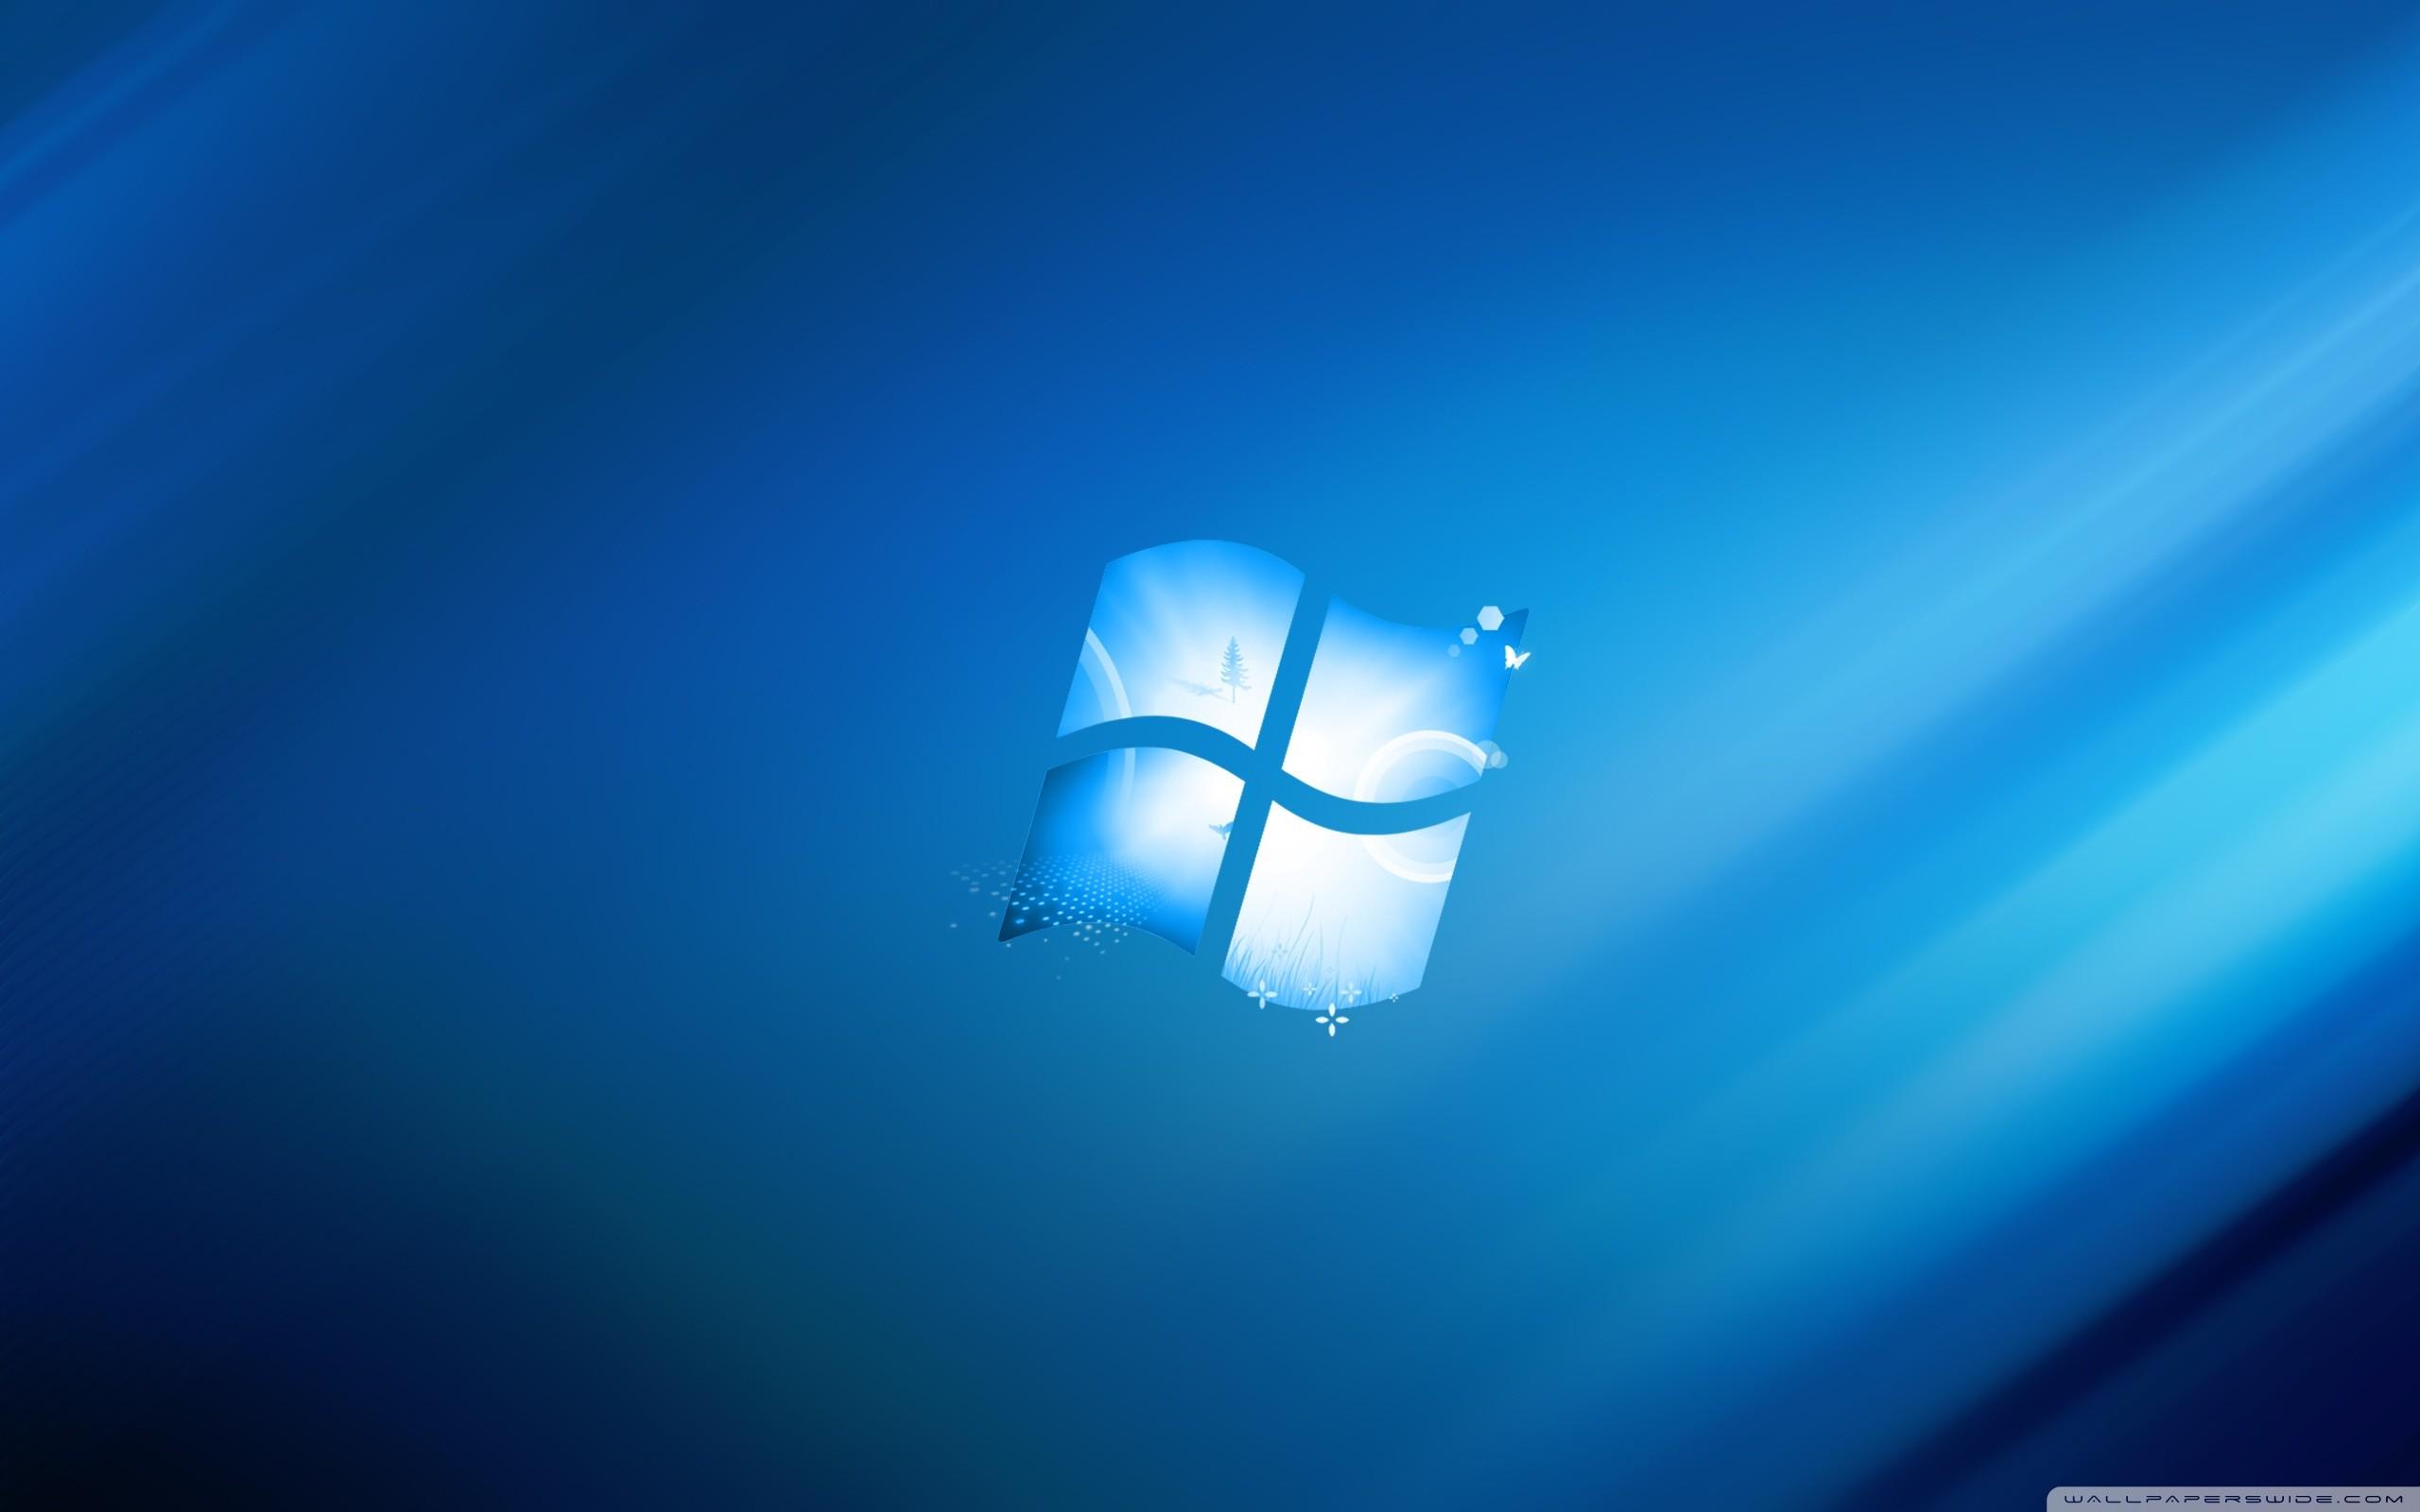 Blue HD Desktop Wallpaper